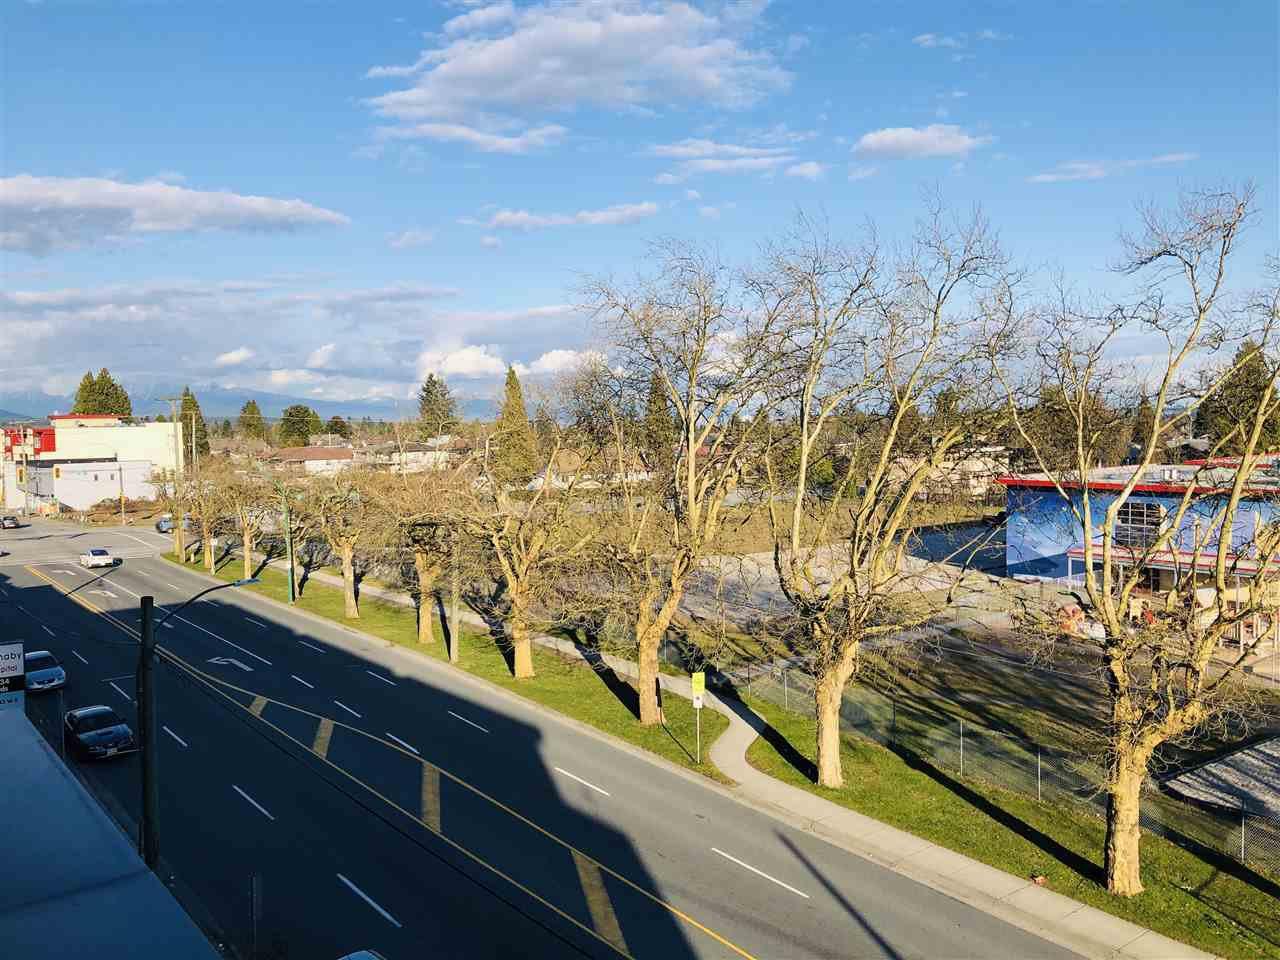 Photo 19: Photos: 410 7655 EDMONDS Street in Burnaby: Highgate Condo for sale (Burnaby South)  : MLS®# R2447298